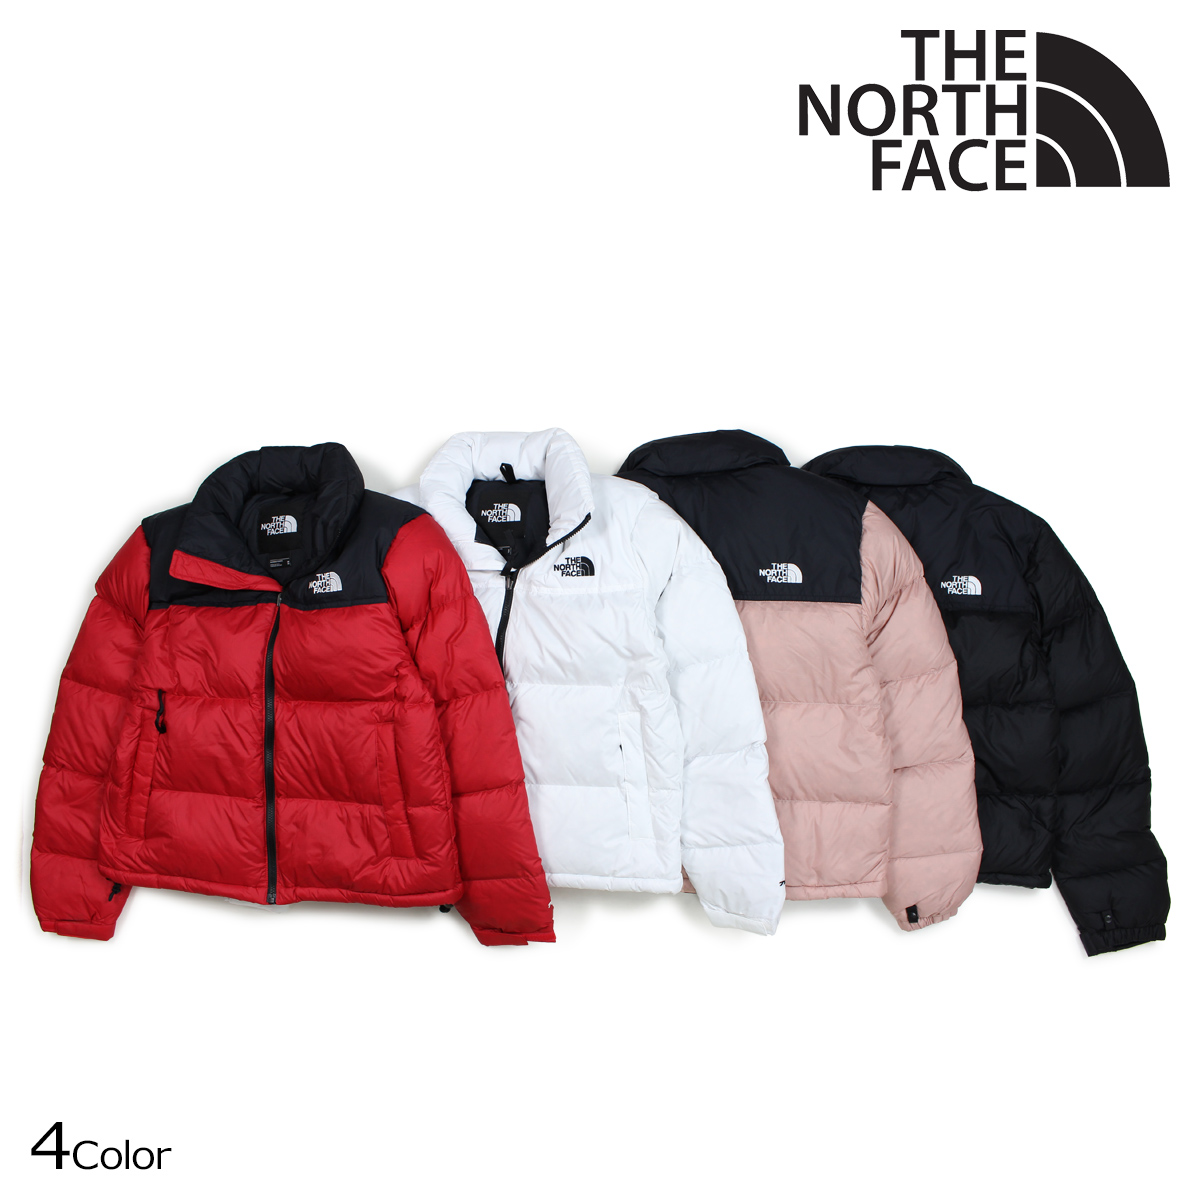 9df69ceb8b THE NORTH FACE WOMENS 1996 RETRO NUPTSE JACKET North Face jacket 1996  レトロヌプシジャケットマウンテンジャケットレディースメンズ NF0A3JQR  10 10 Shinnyu ...